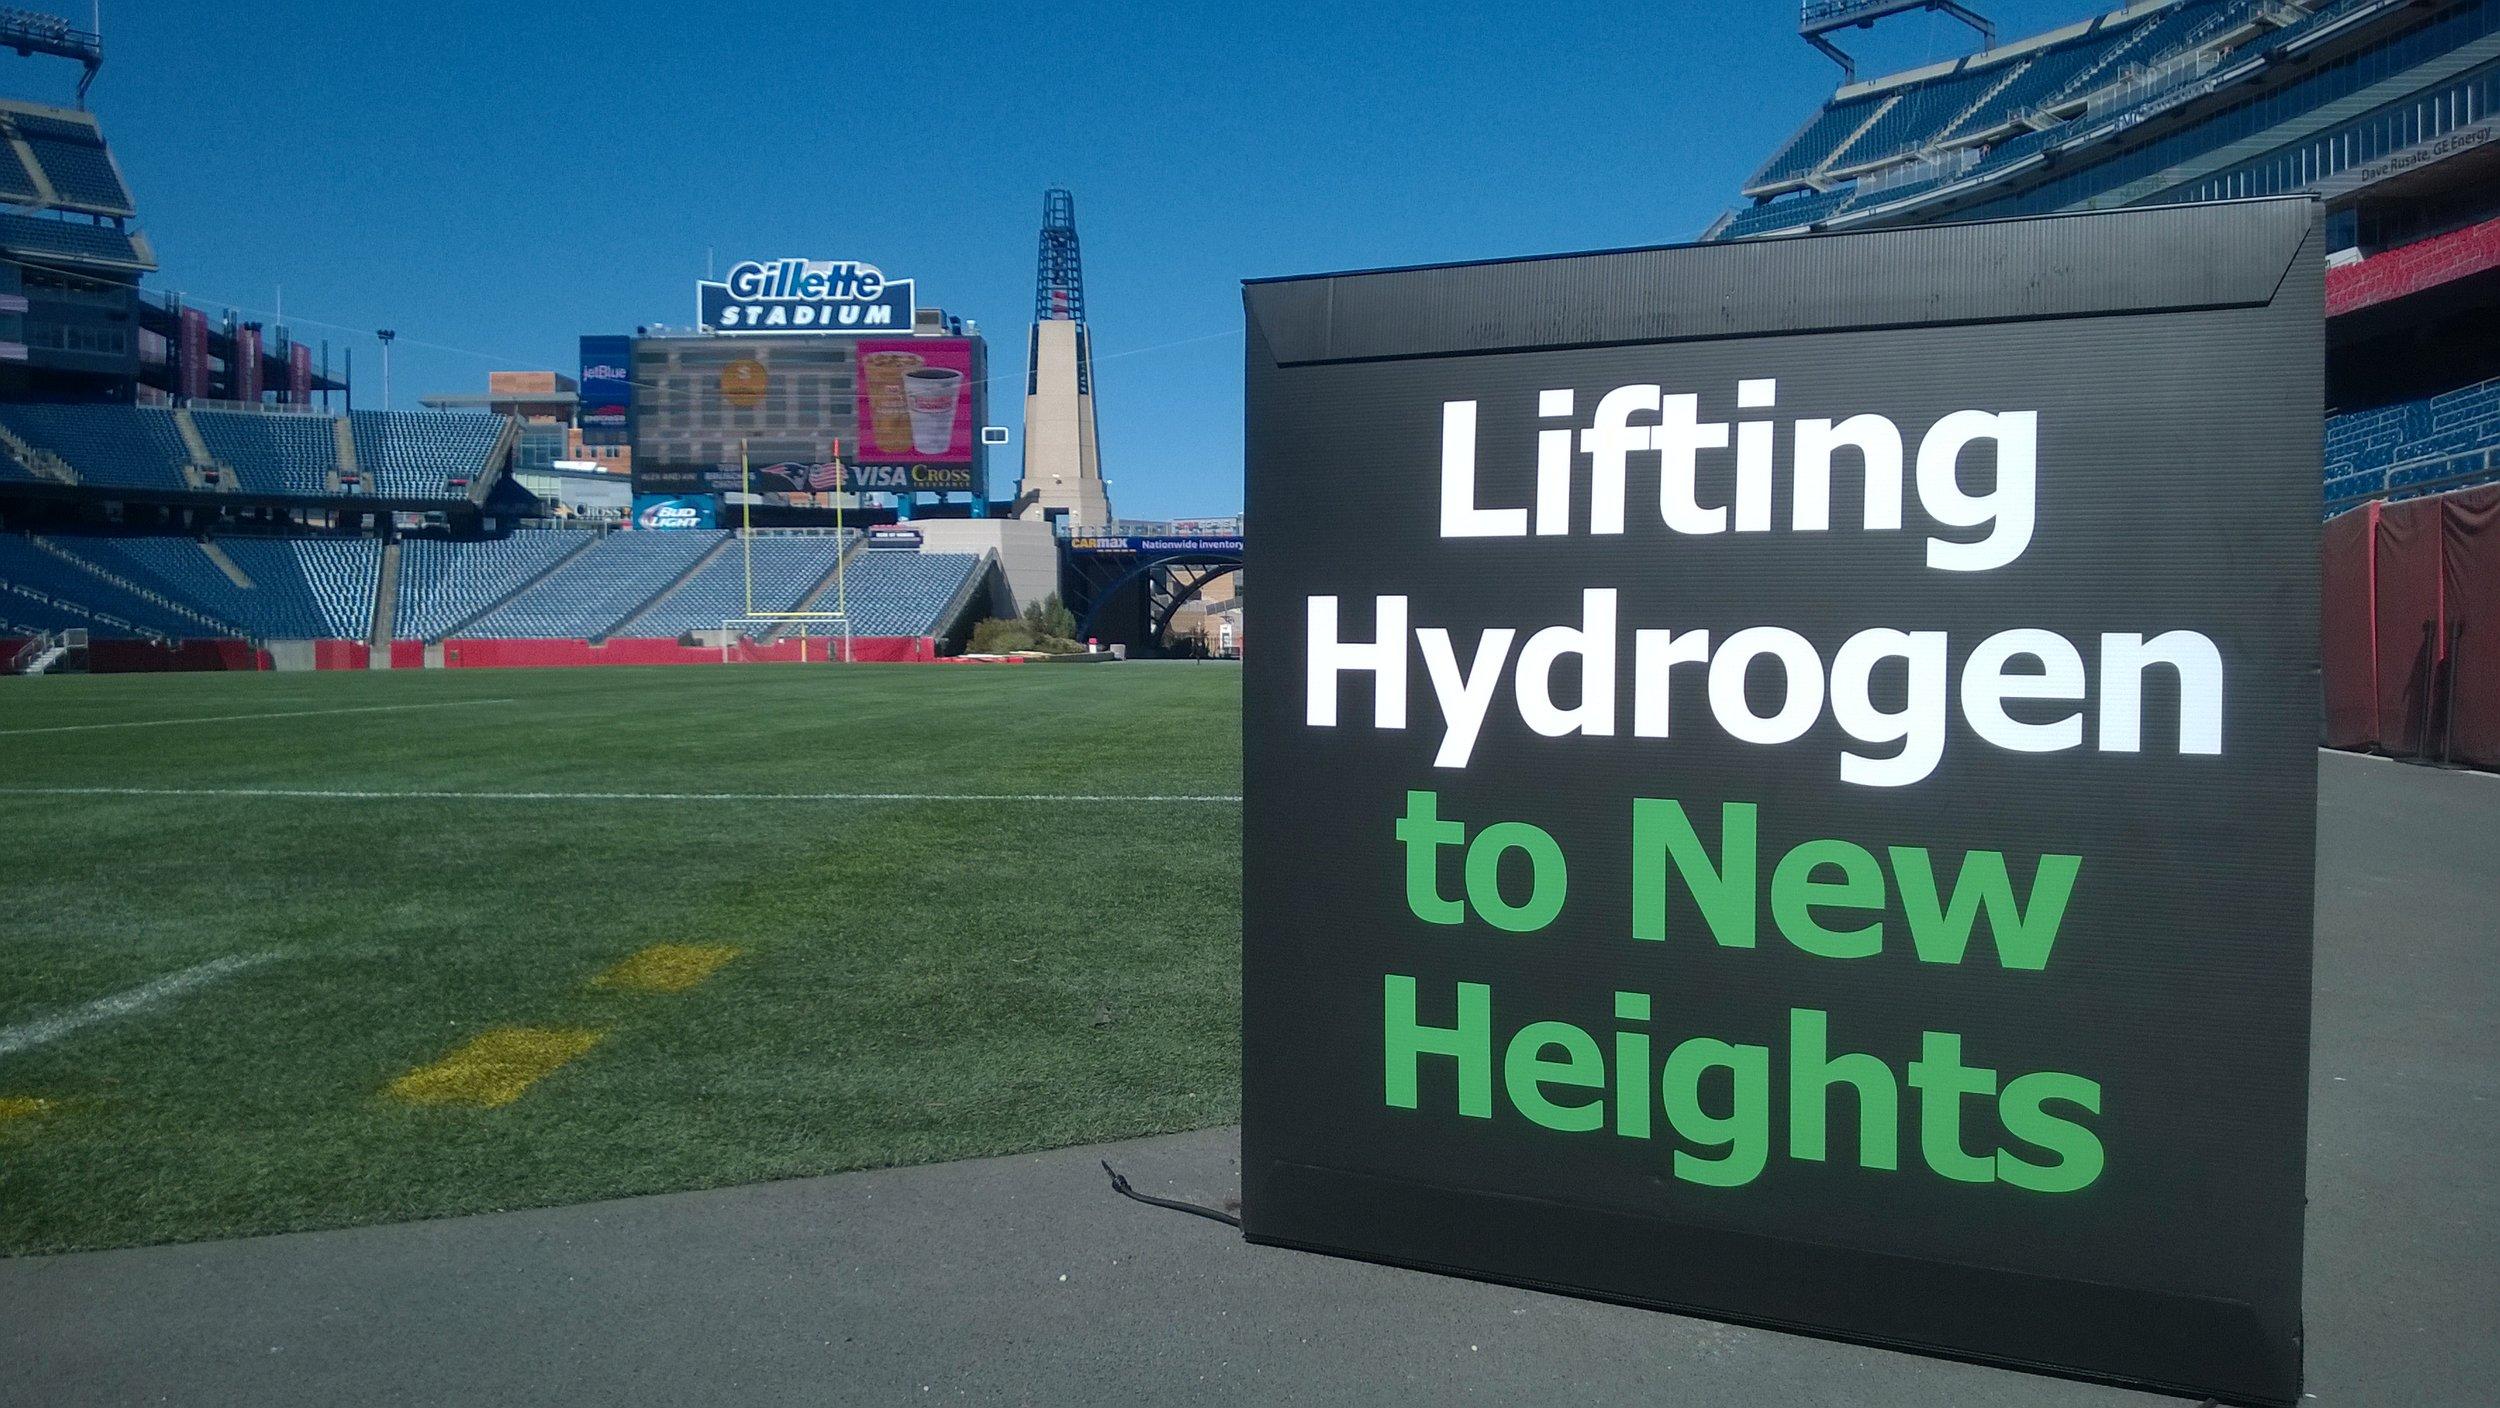 Nuvera sign at Gillette Stadium in Foxborough, Massachussetts